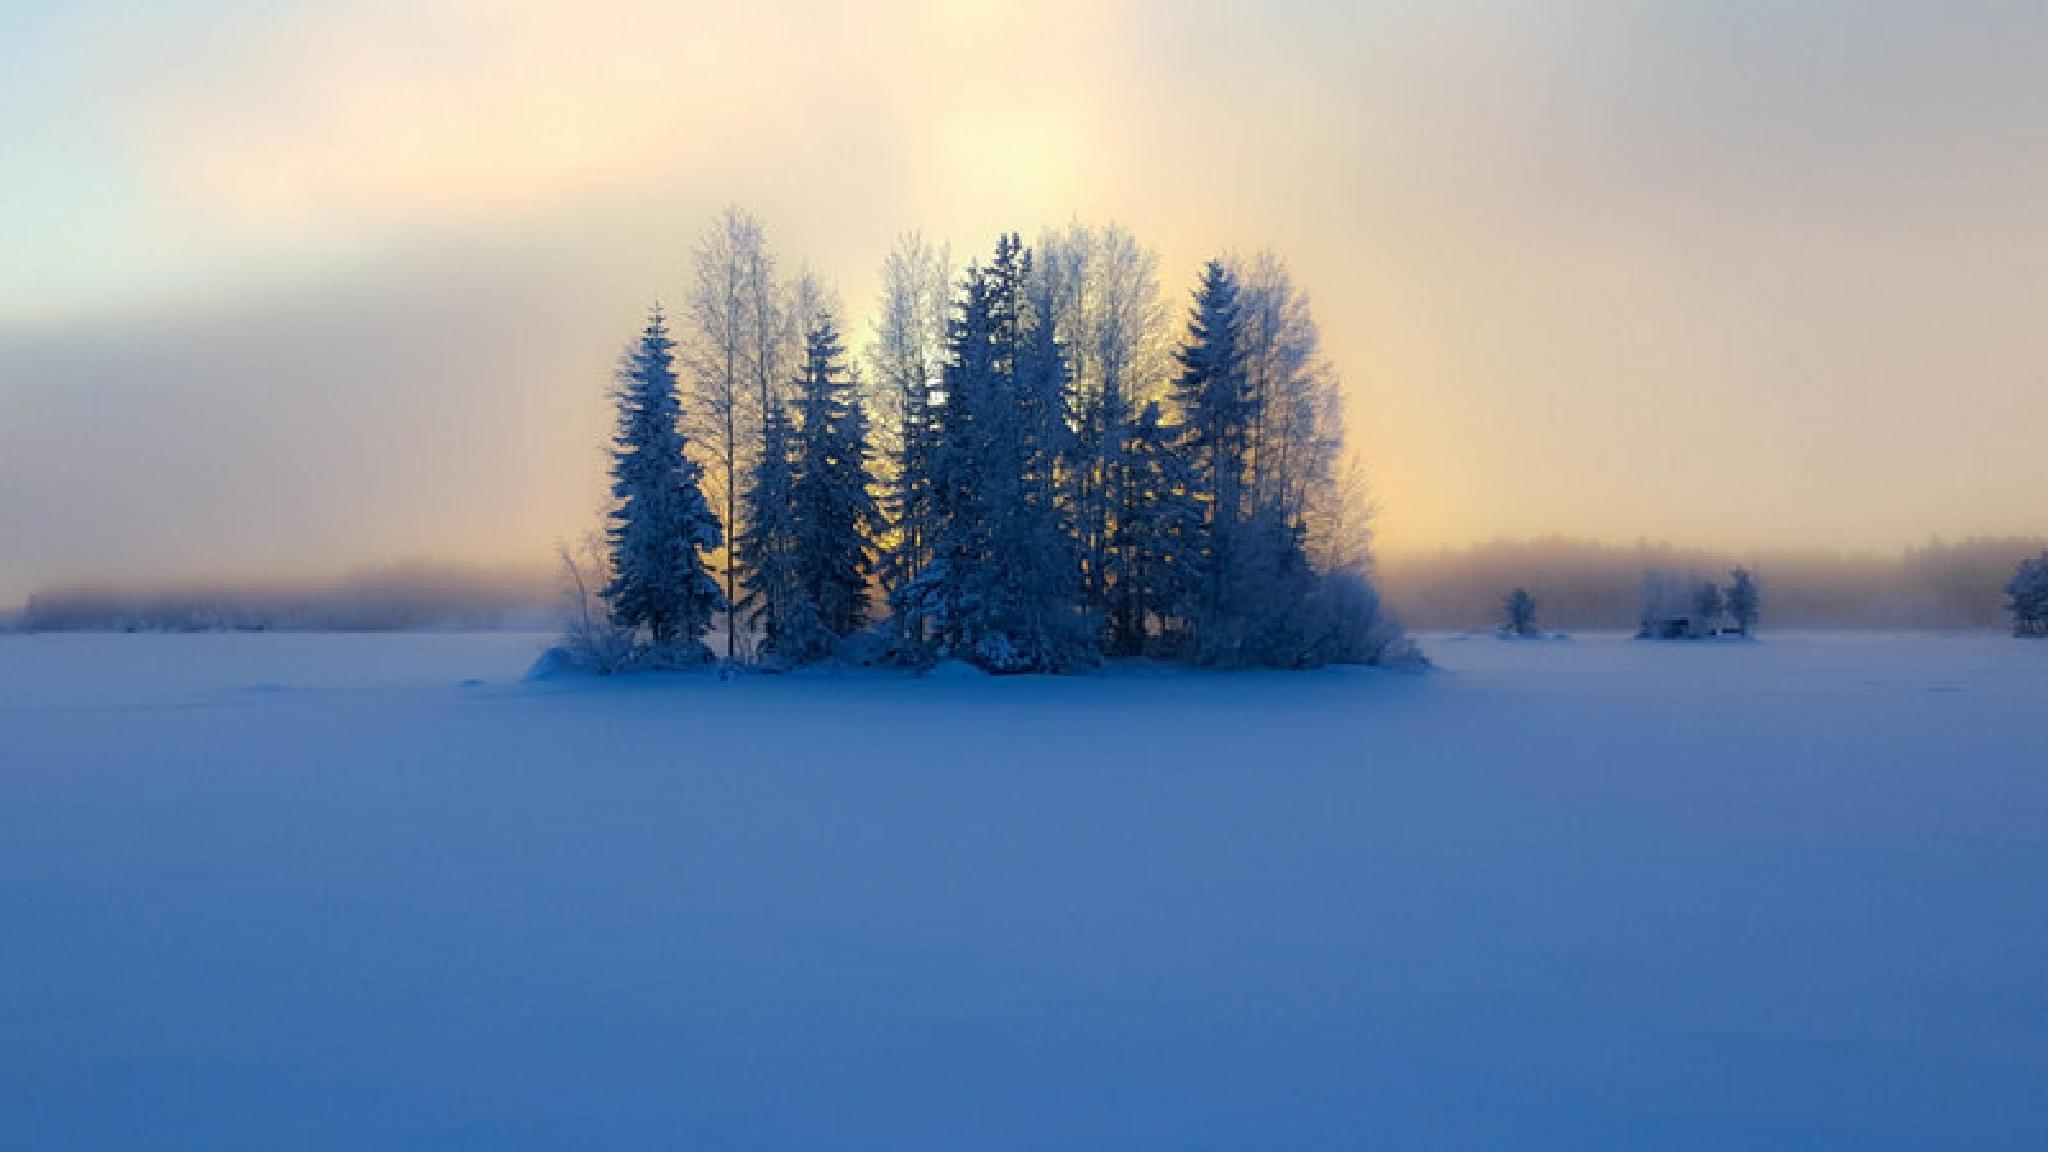 Frozen island by Kari Aho